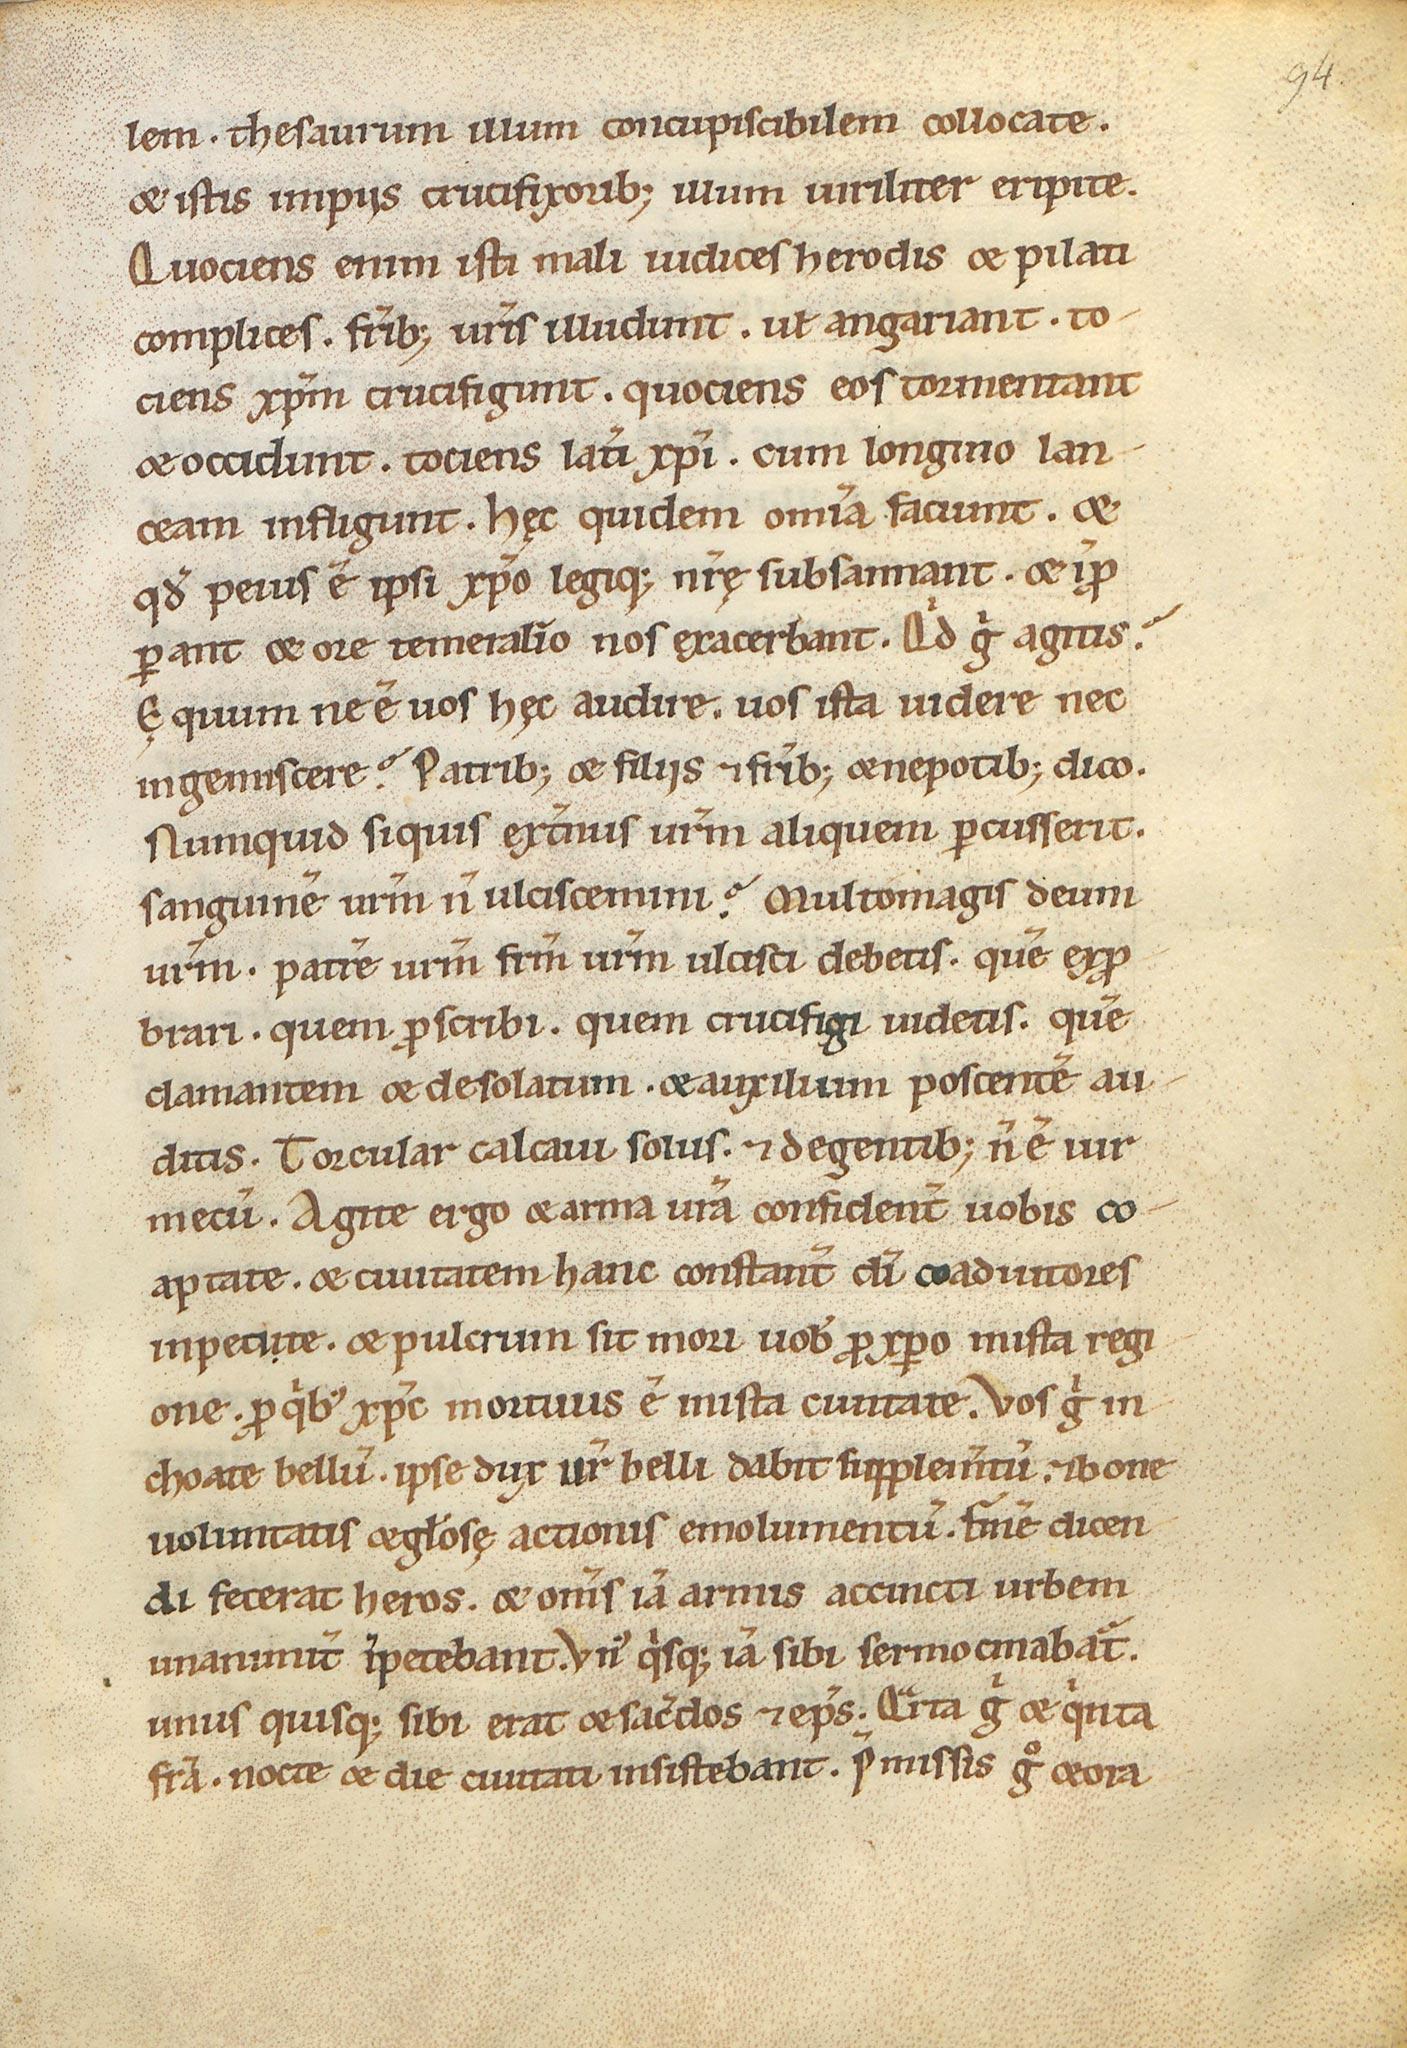 Manuscrit-Historia-Hierosolimitana-94r°